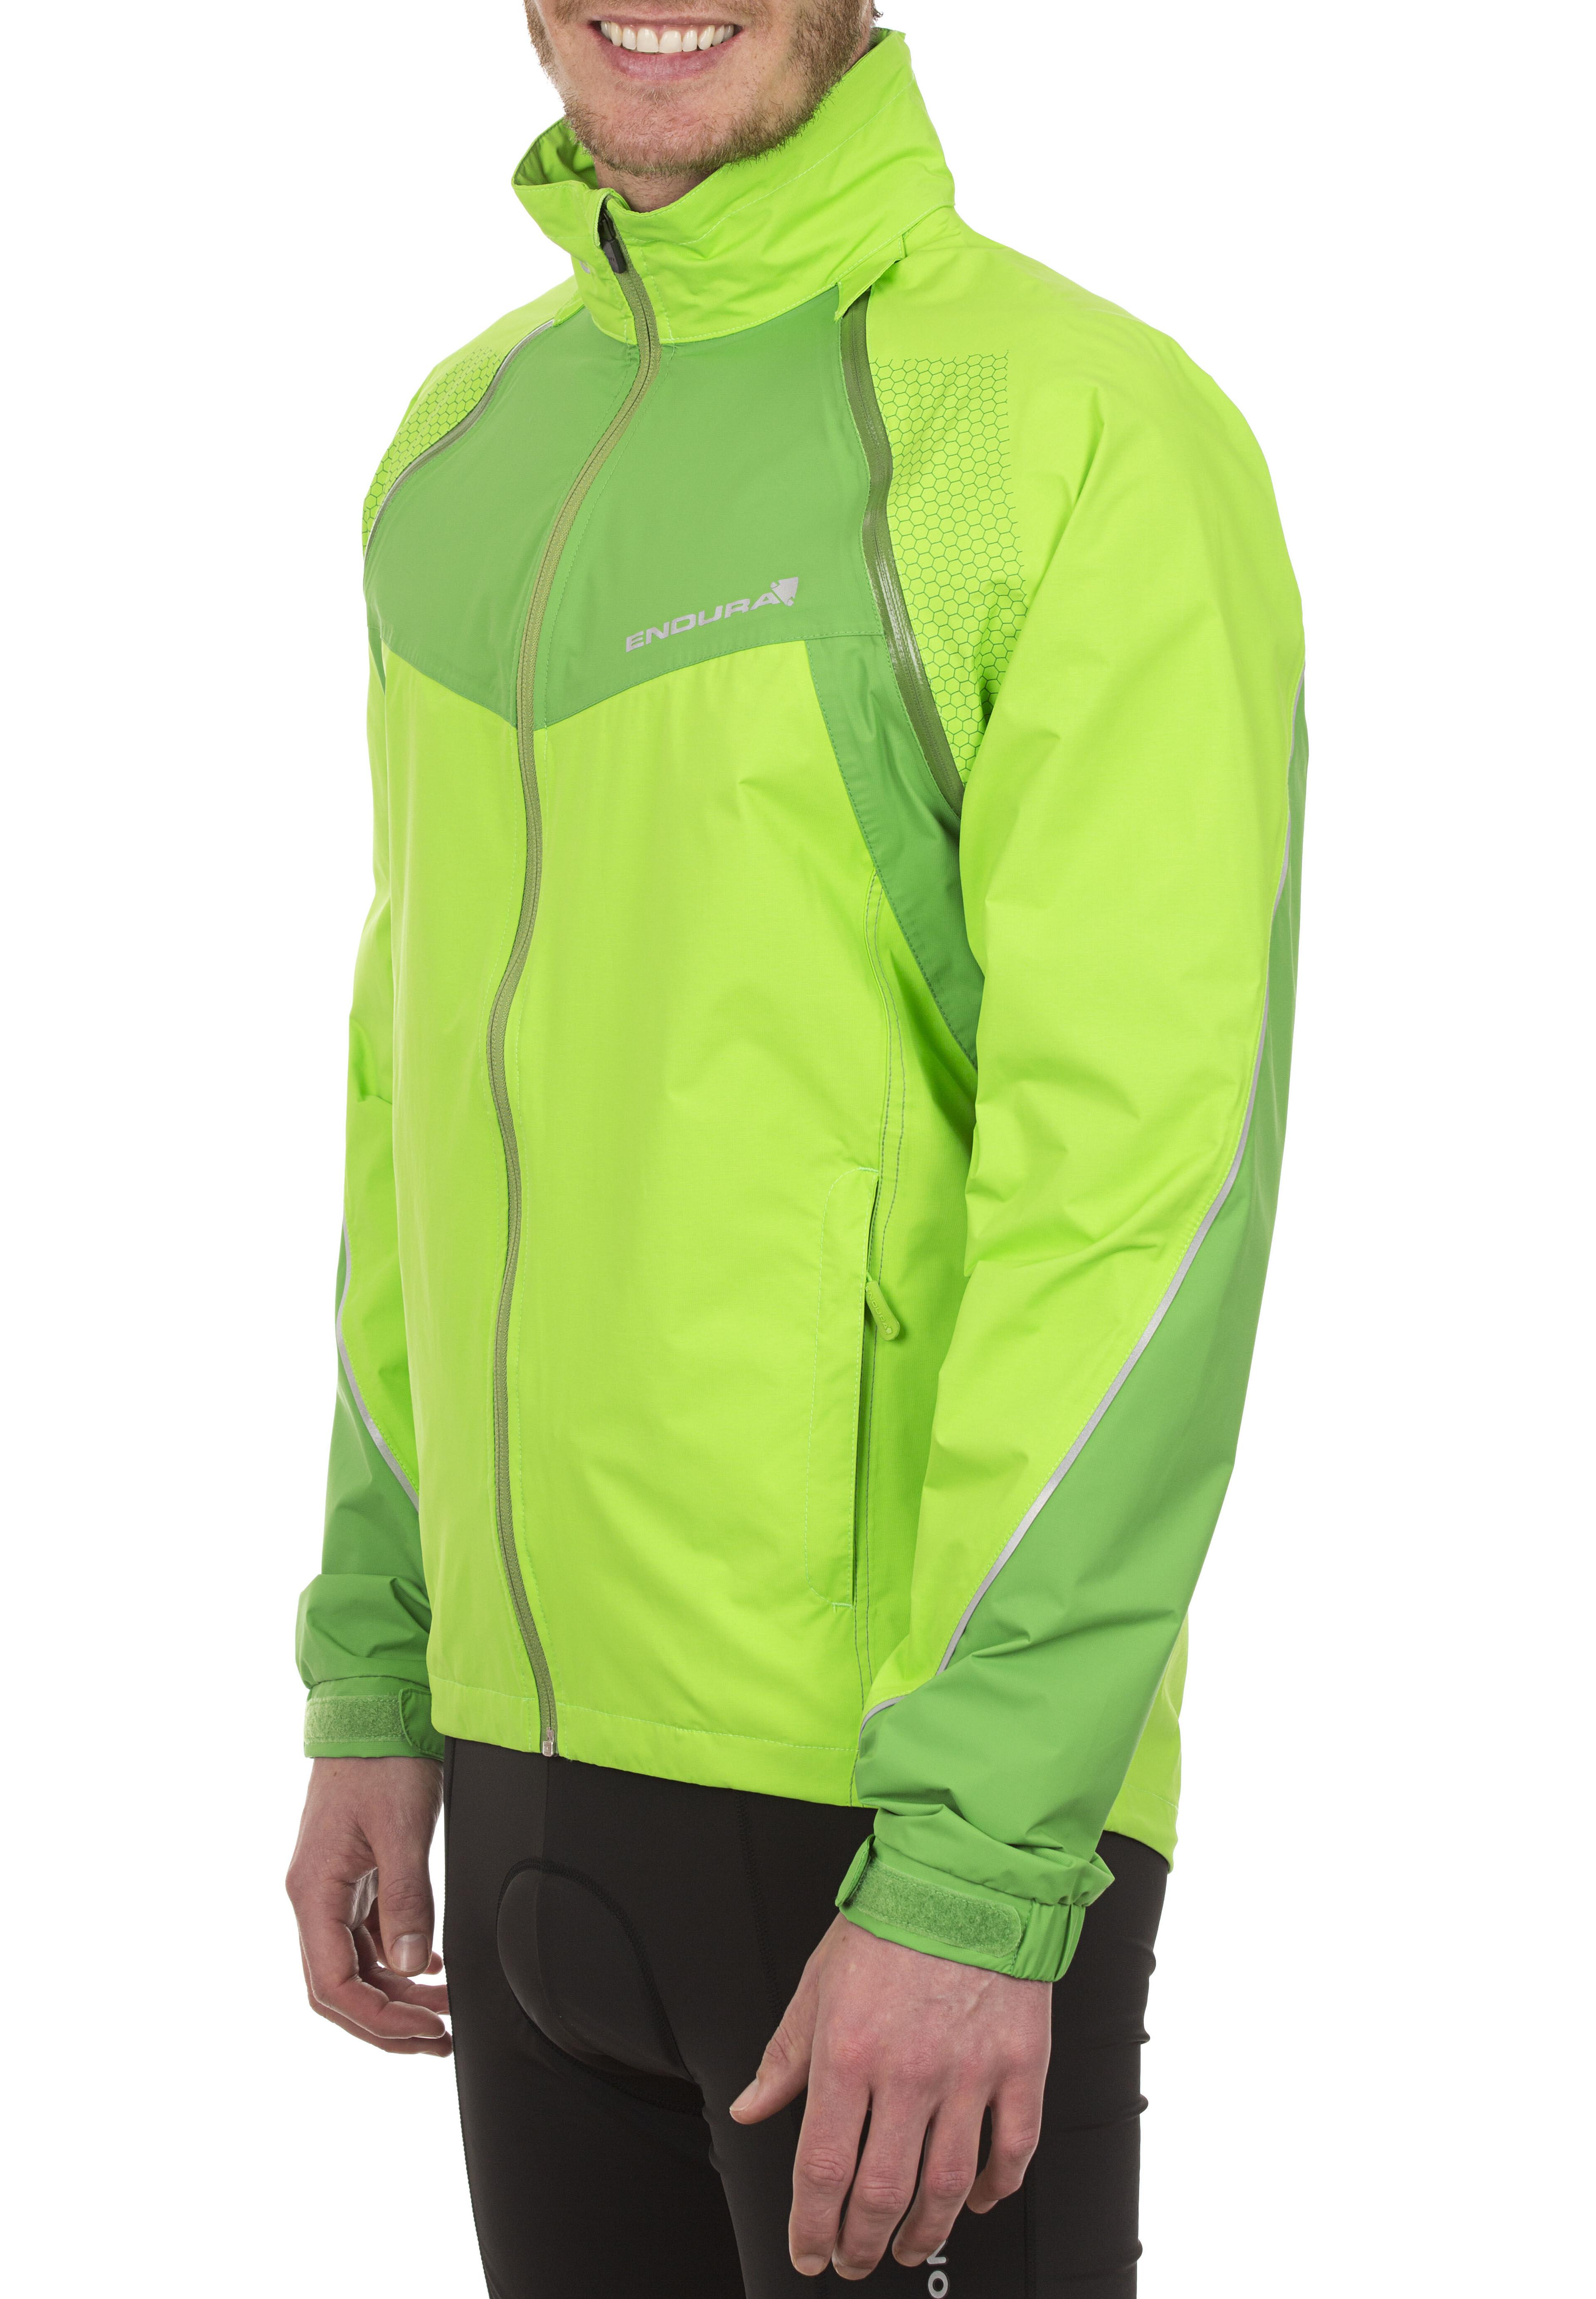 90dcf9d67 Endura Hummvee Jacket Men Convertible green at Bikester.co.uk